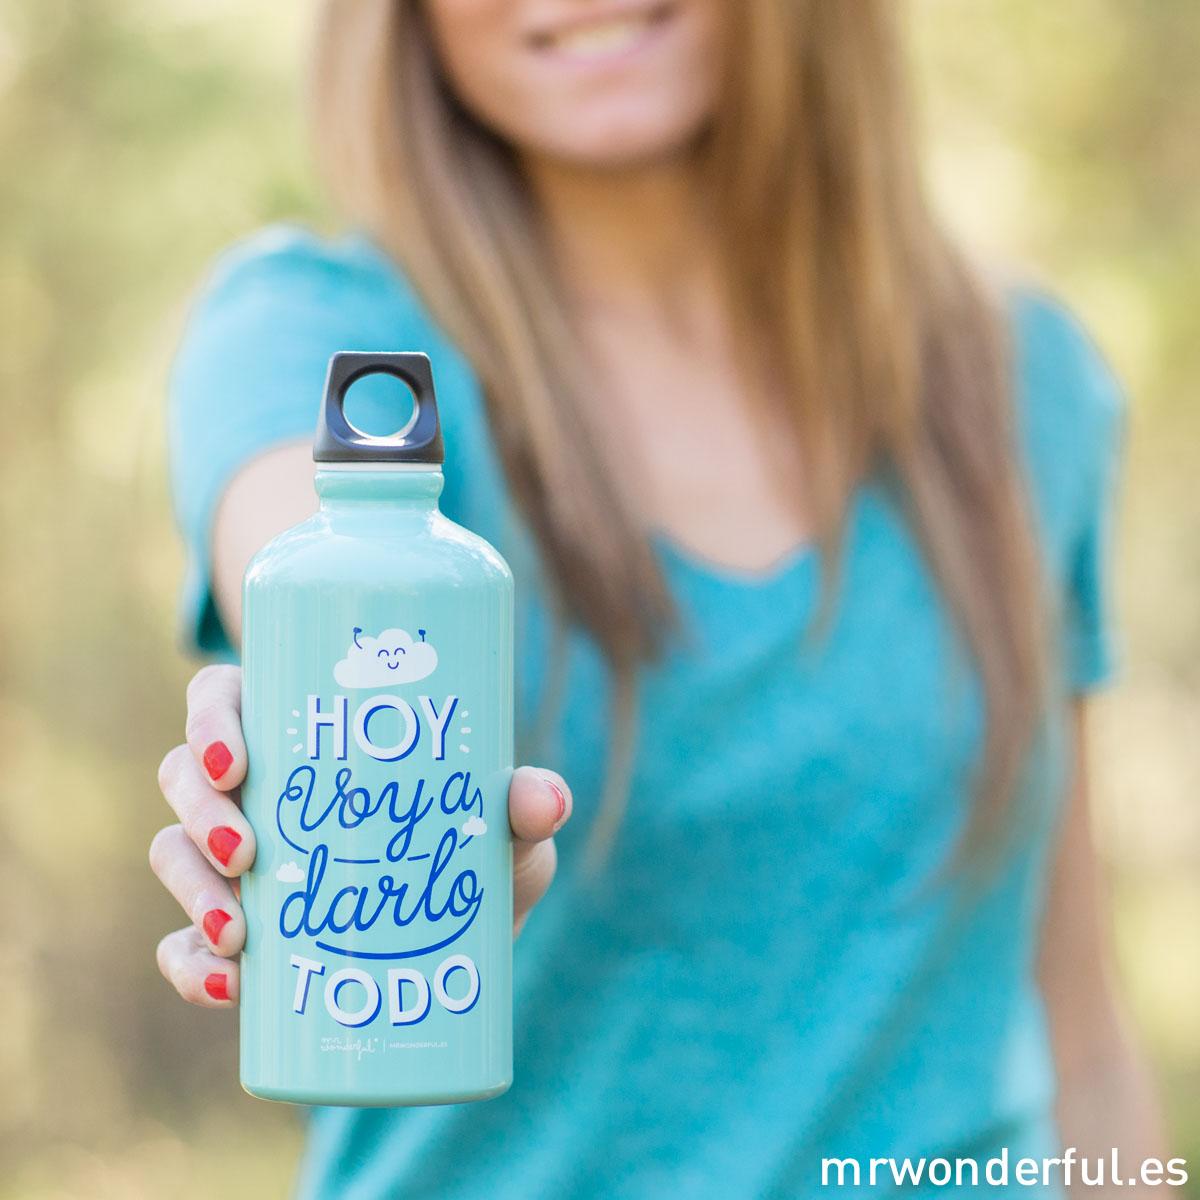 mrwonderful_8436547193844_Botella-de-aluminio_Hoy-voy-a-darlo-todo-140-Editar